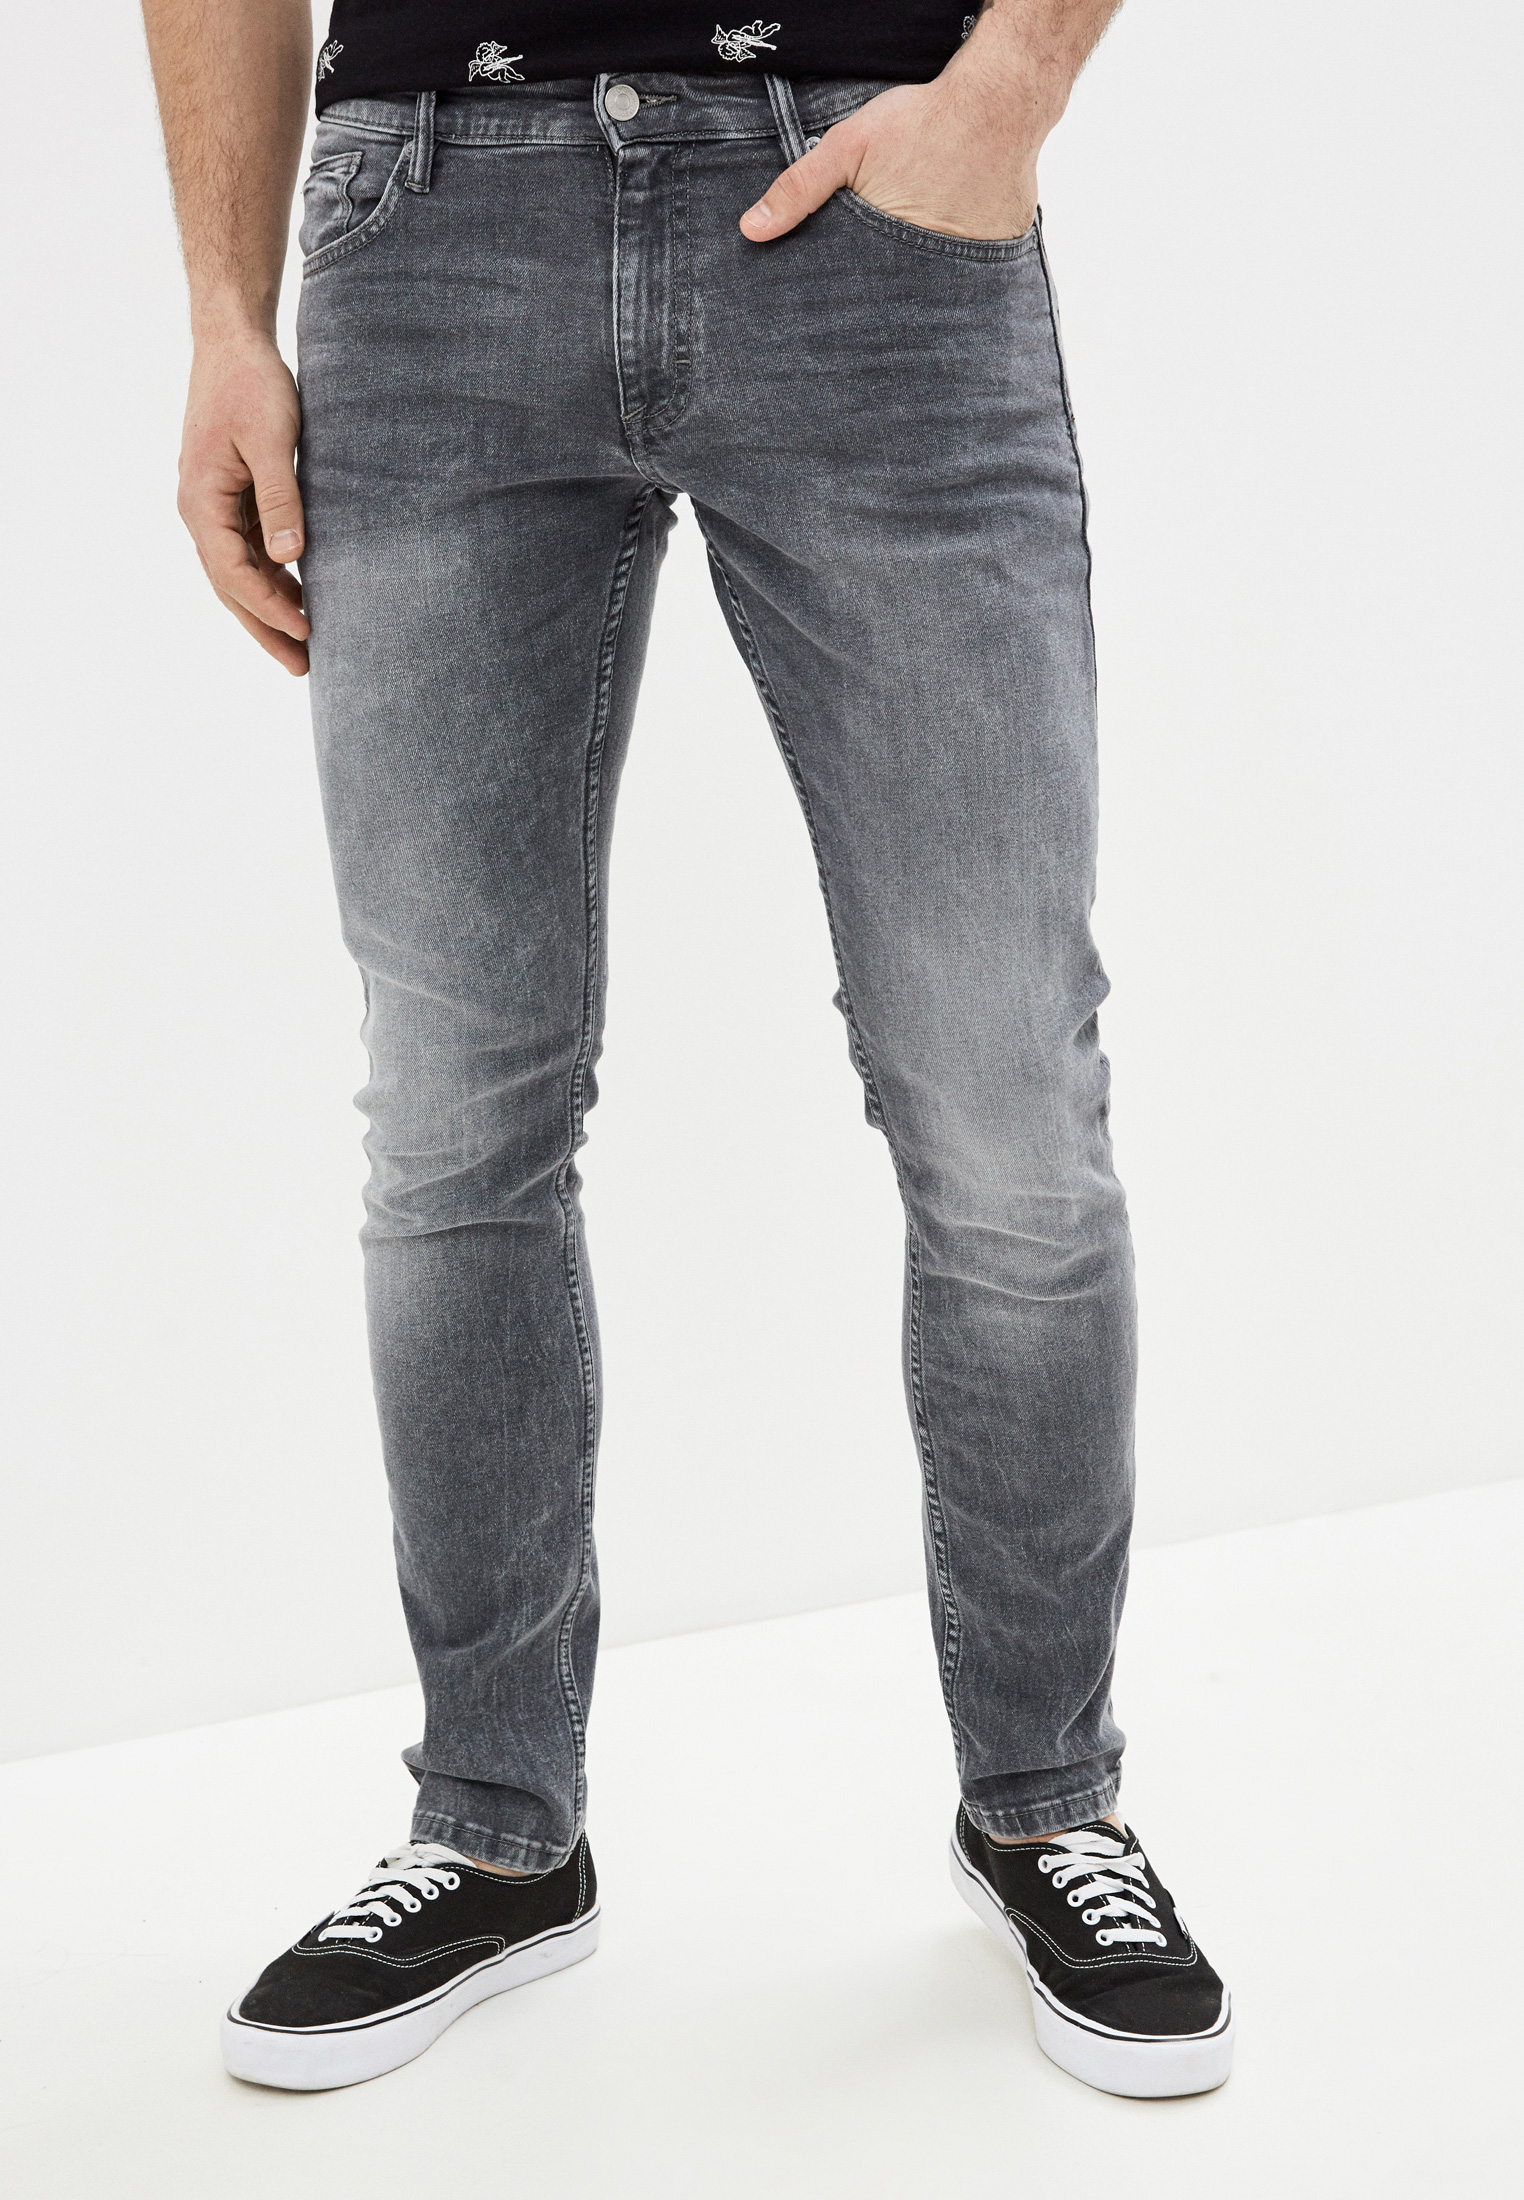 Зауженные джинсы Q/S designed by 520.11.899.26.180.2005616